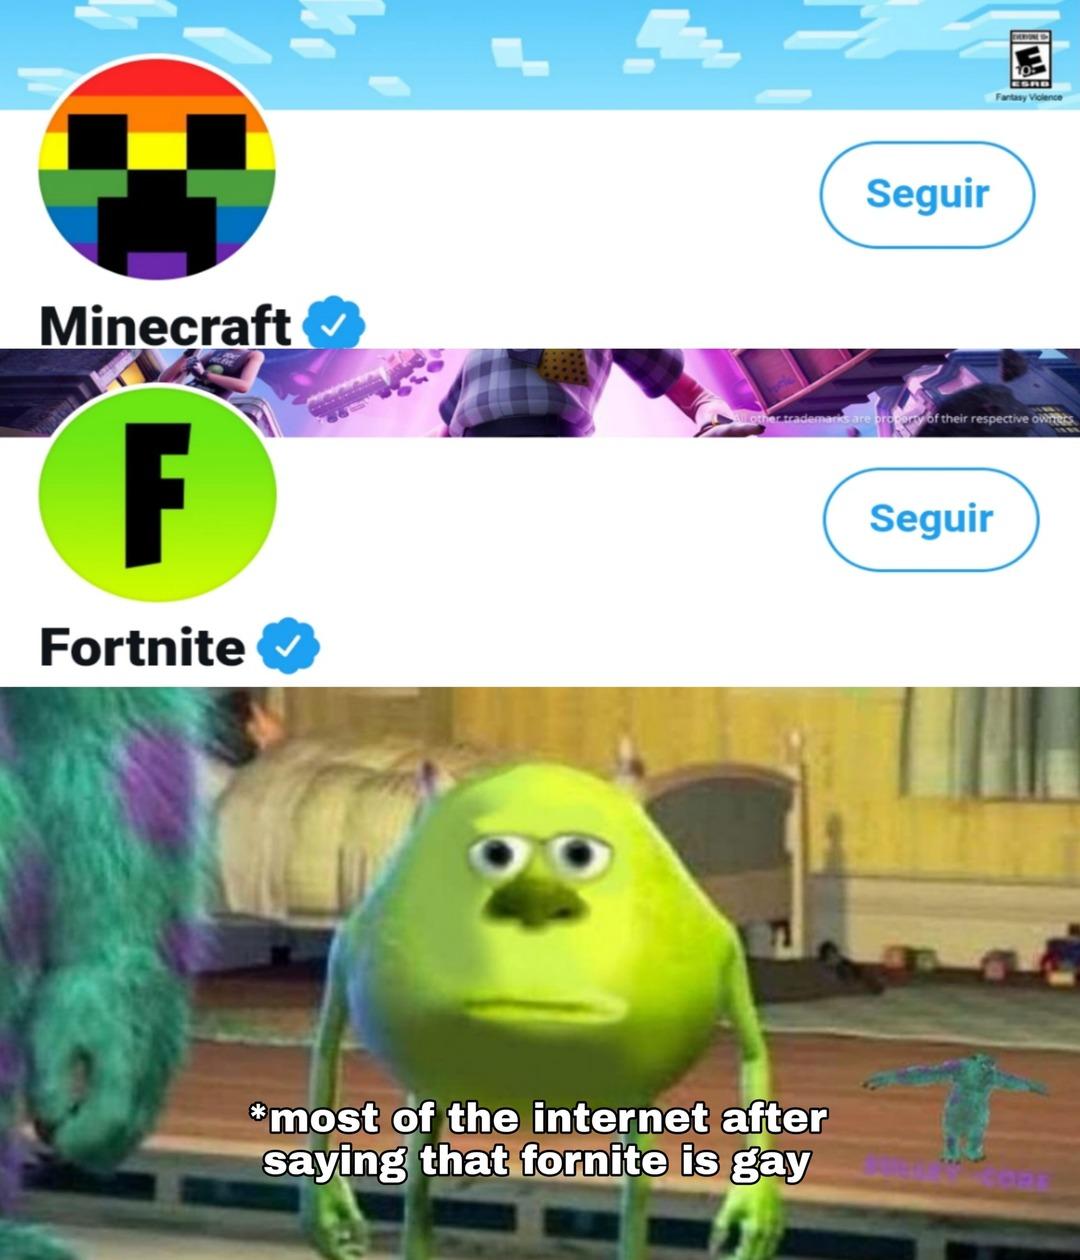 fortnite is cool minecraft is gay - meme